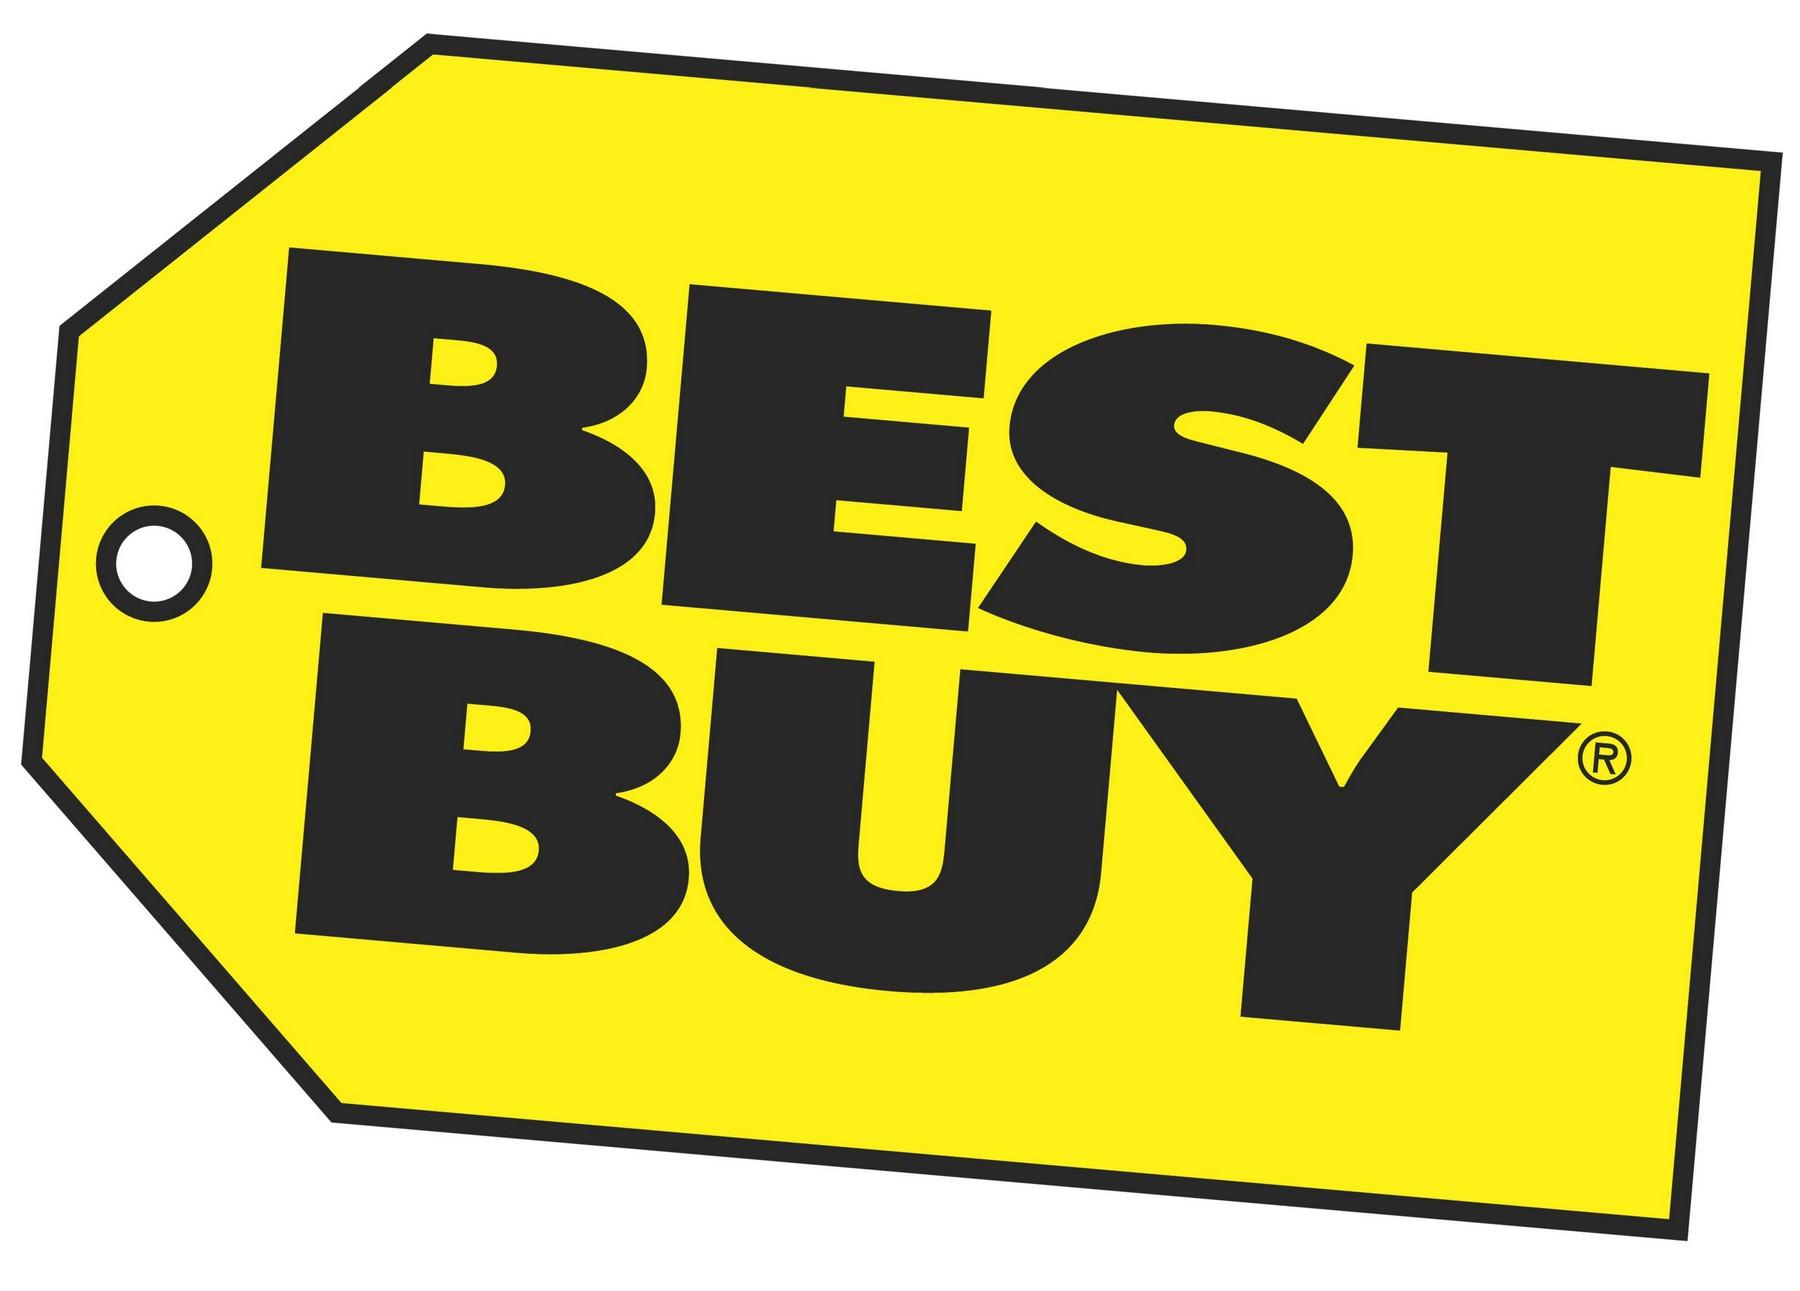 Best_buy_logo-4